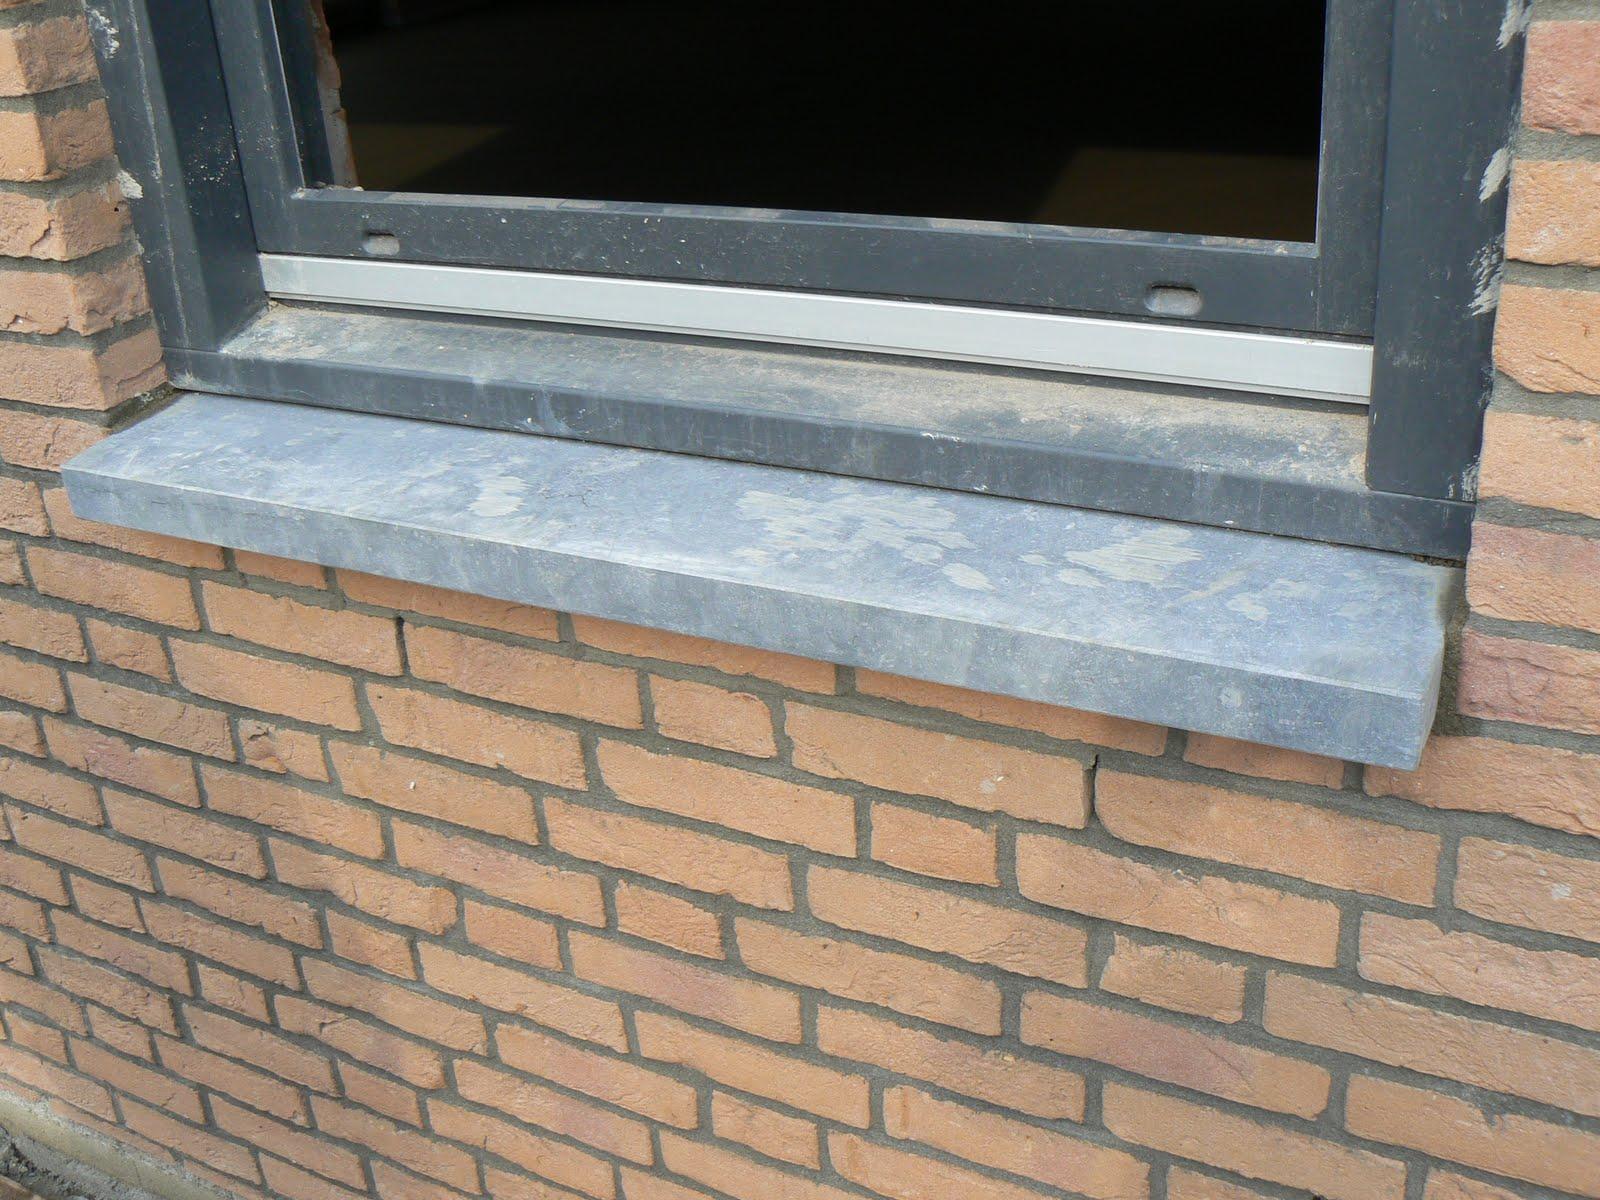 Vensterbank Tegels Buiten : Vensterbank tegels buiten verven tegels verven buiten tegels